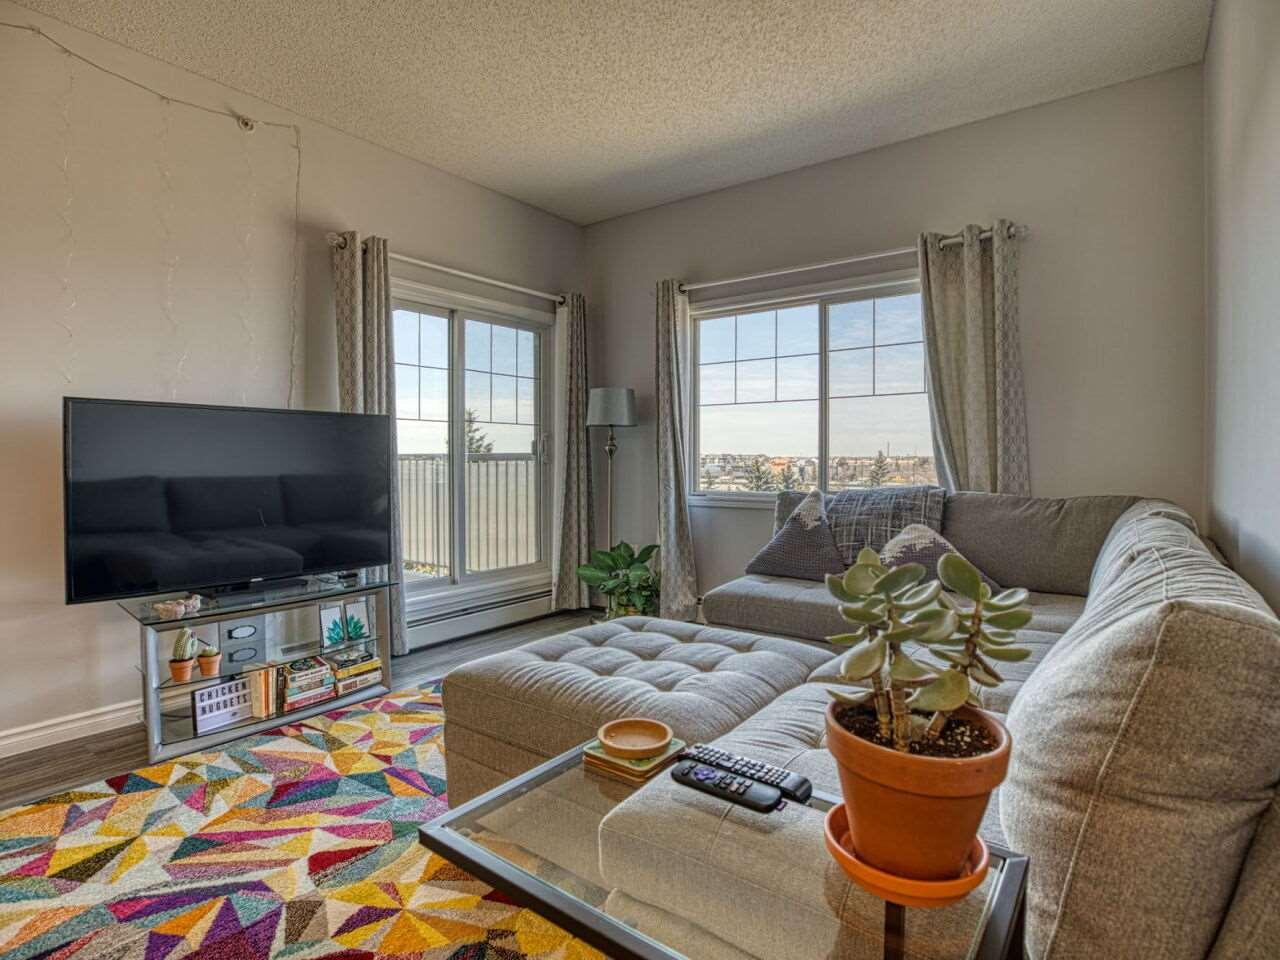 429 16807 100 Avenue - Glenwood_EDMO Lowrise Apartment for sale, 2 Bedrooms (E4234341) #13